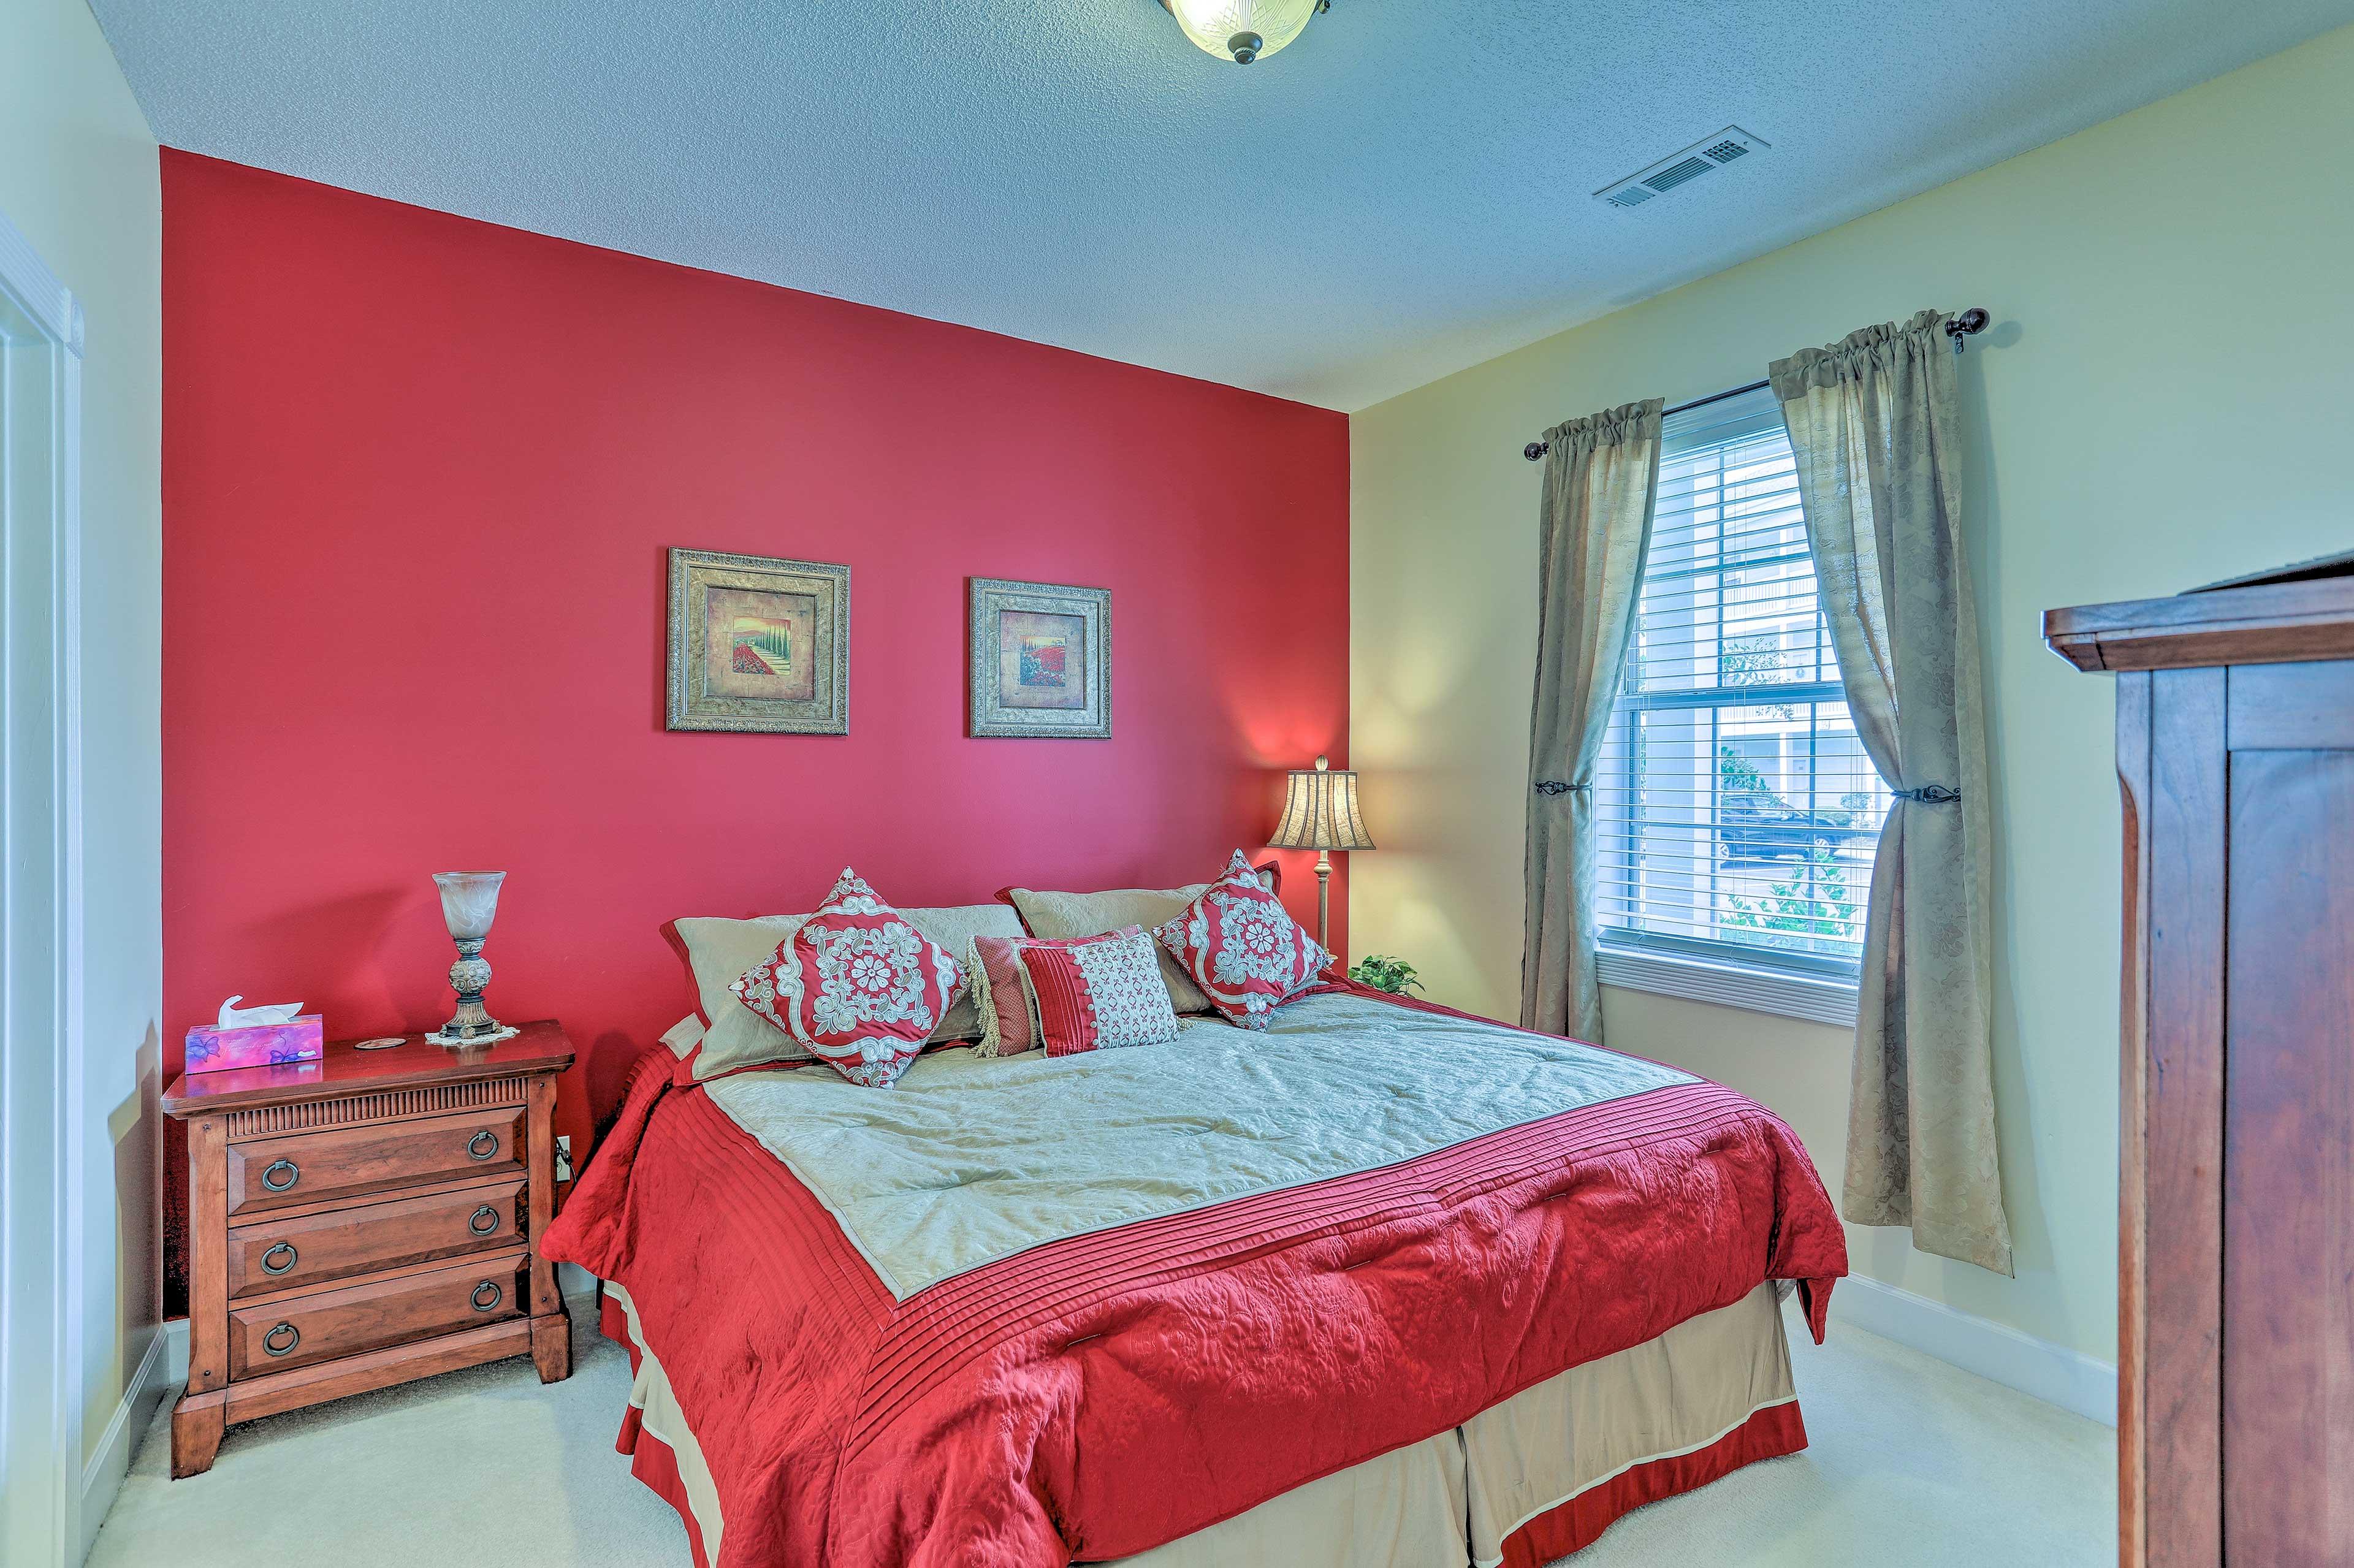 The second bedroom sleeps 2 on a queen bed.